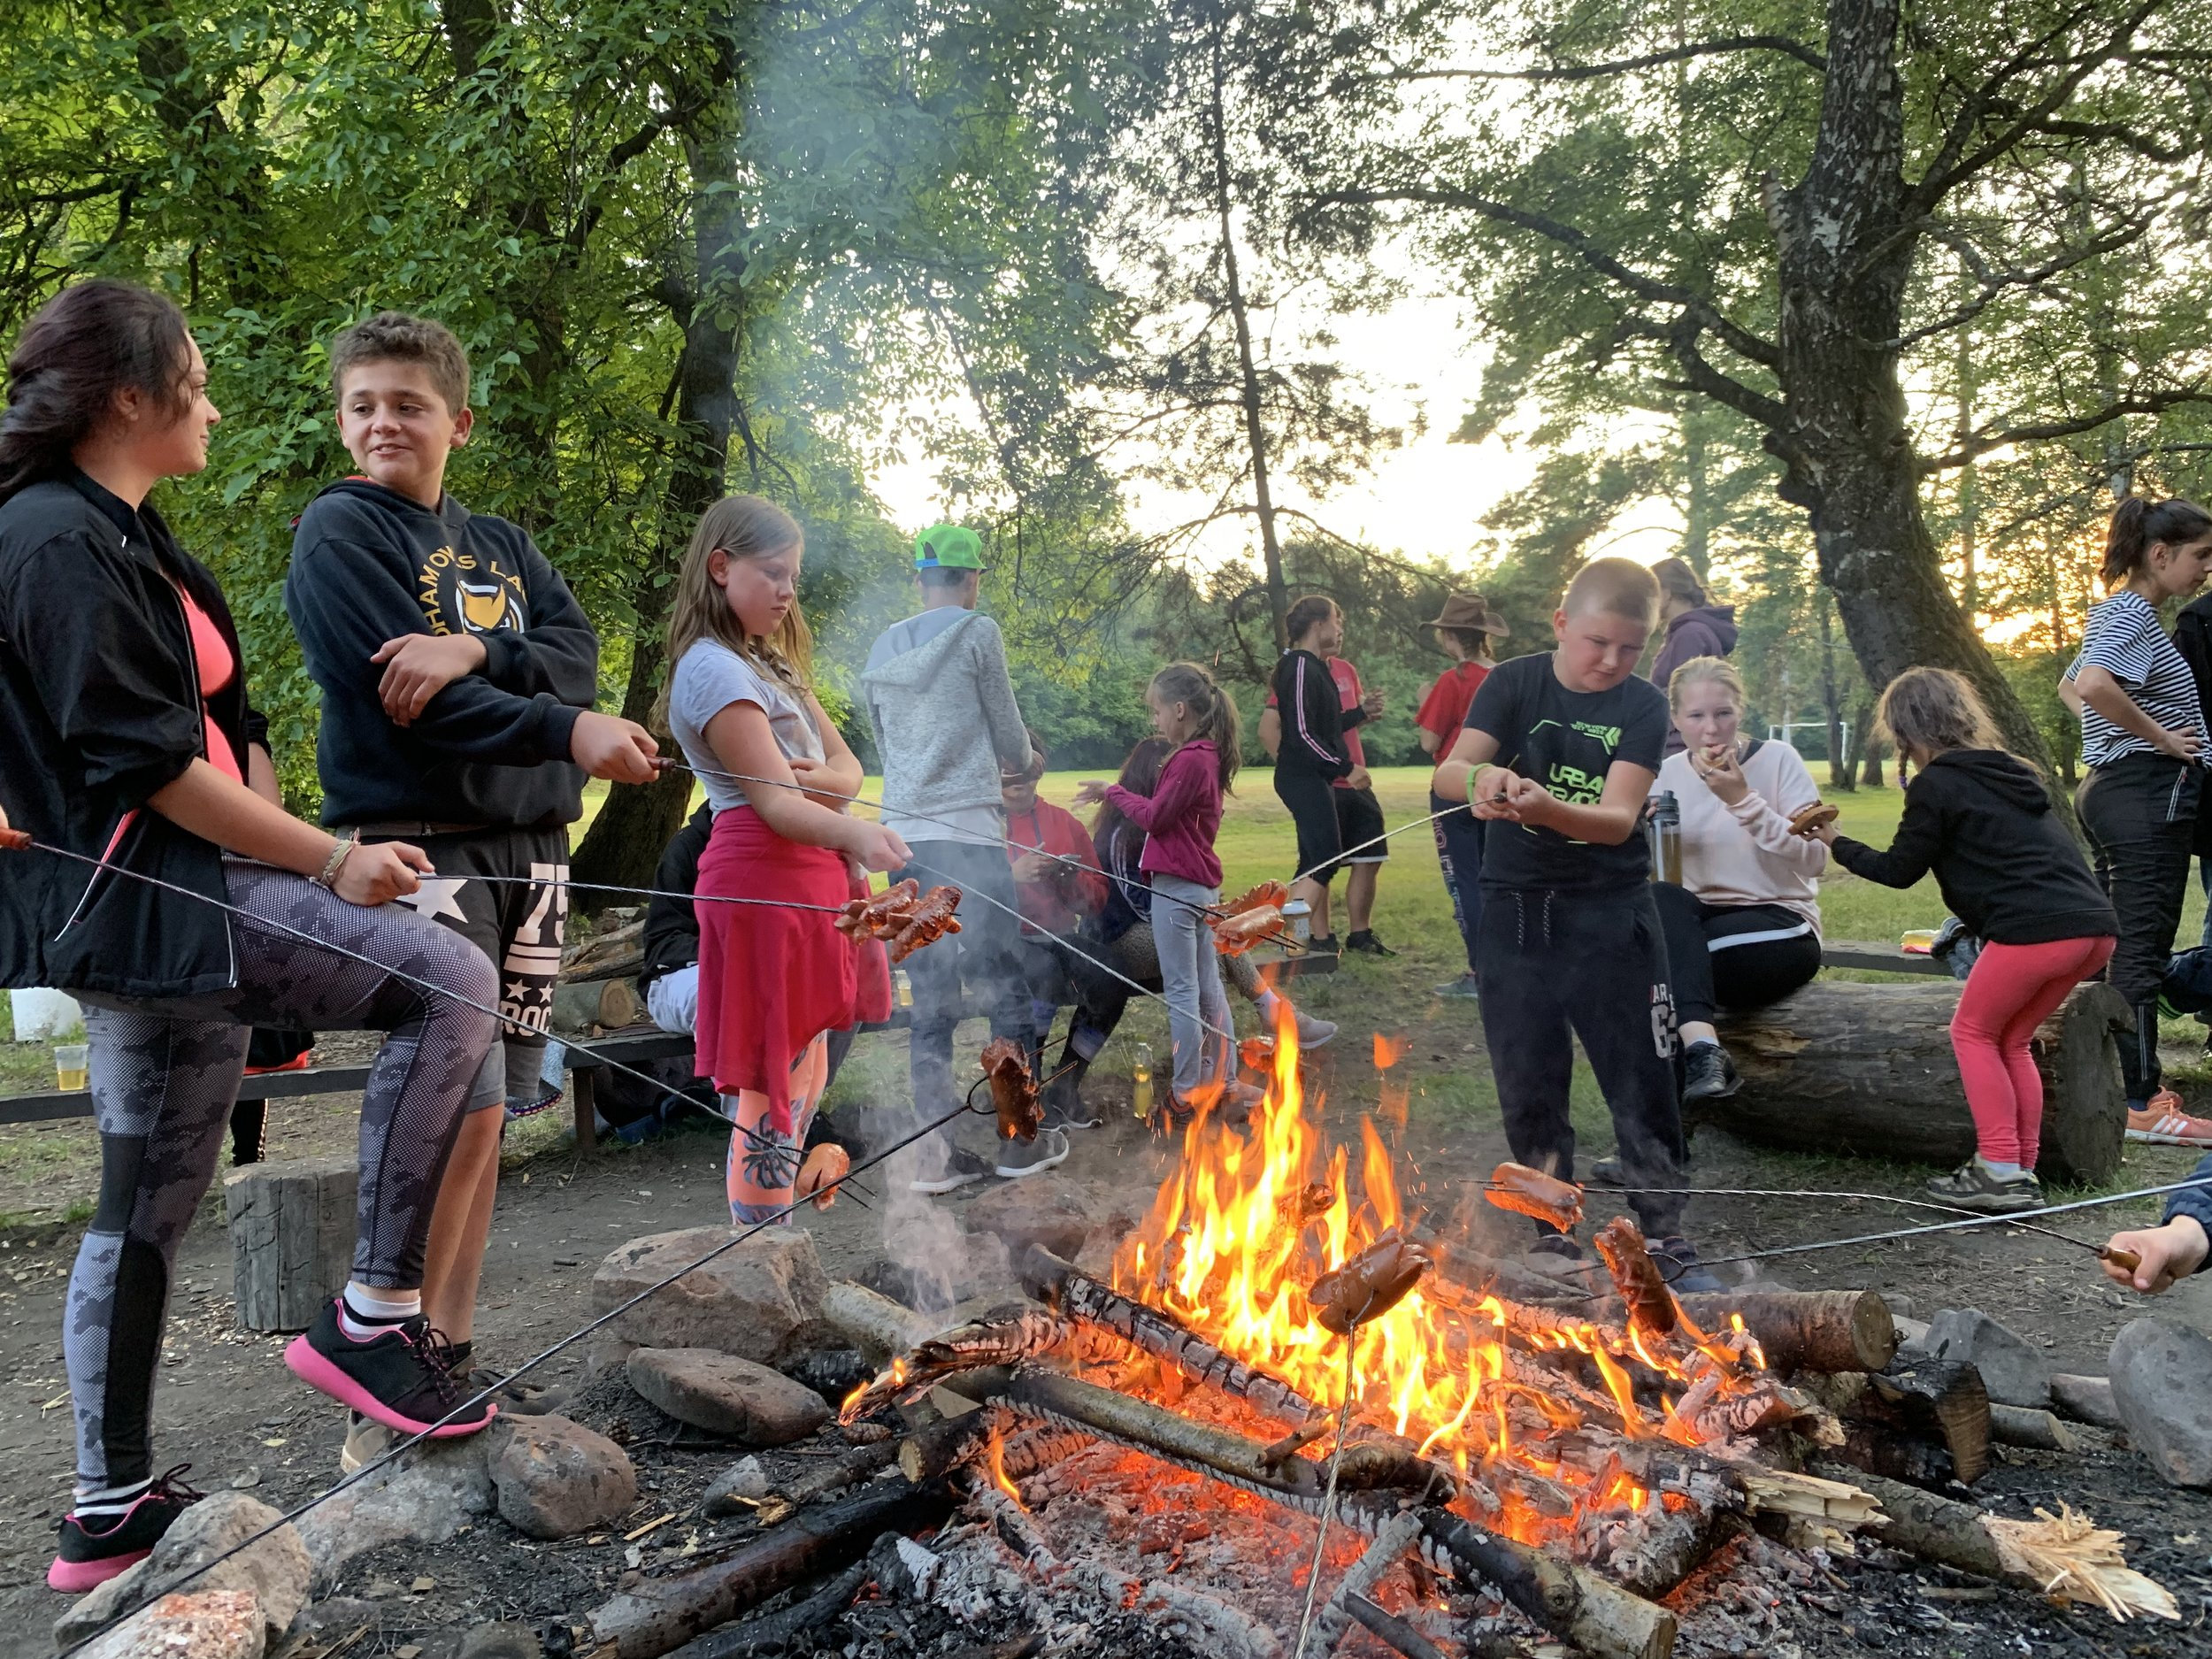 While American's do Smores at campfires, Czechs do Špekáček sausages.